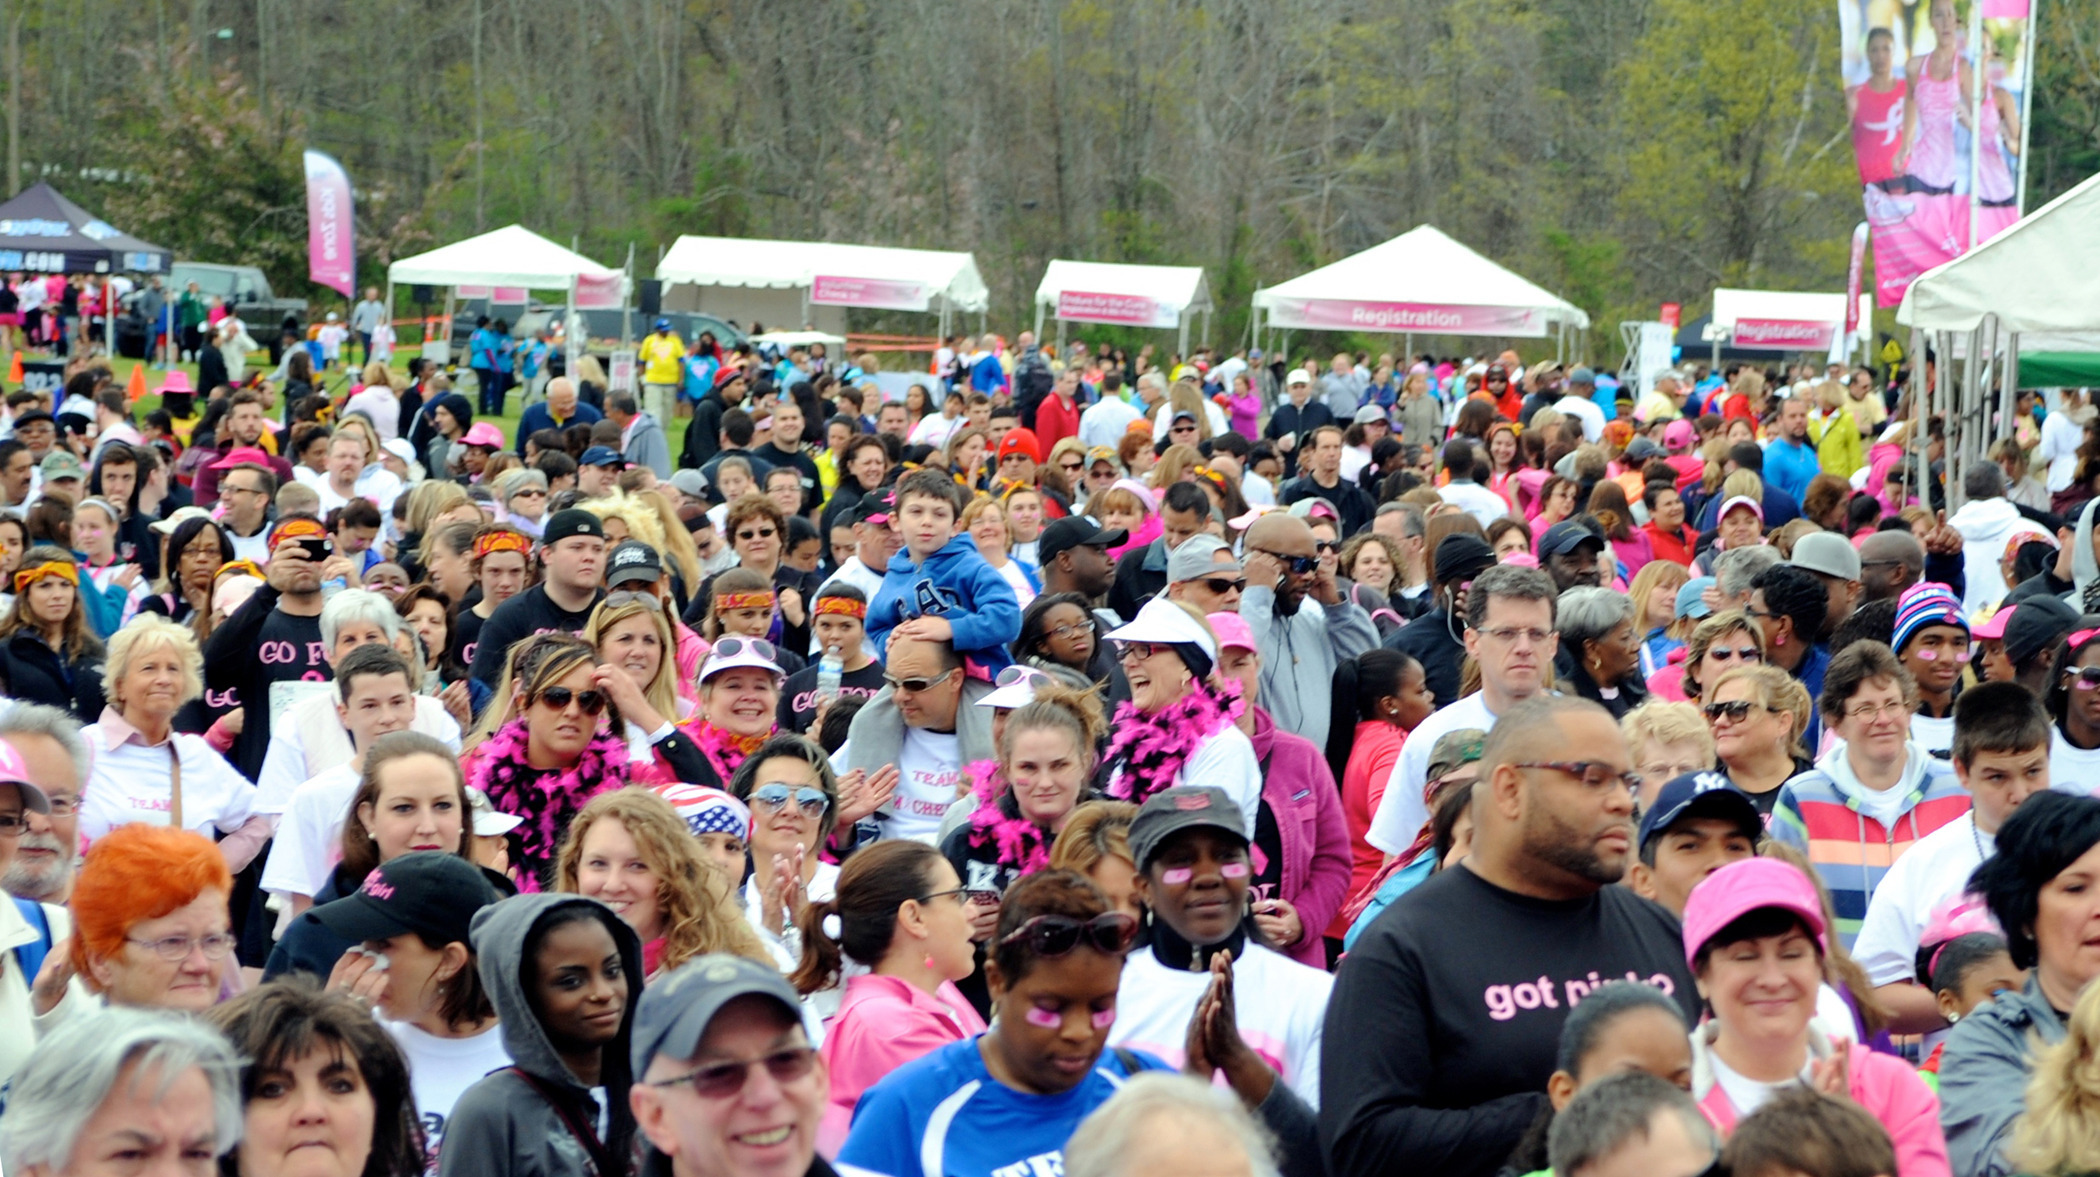 2ed3f4d8966845e1486c_best_7aec75e3e7b73e8d7f3a_SK-Race_Day_Crowd-cropped.jpg